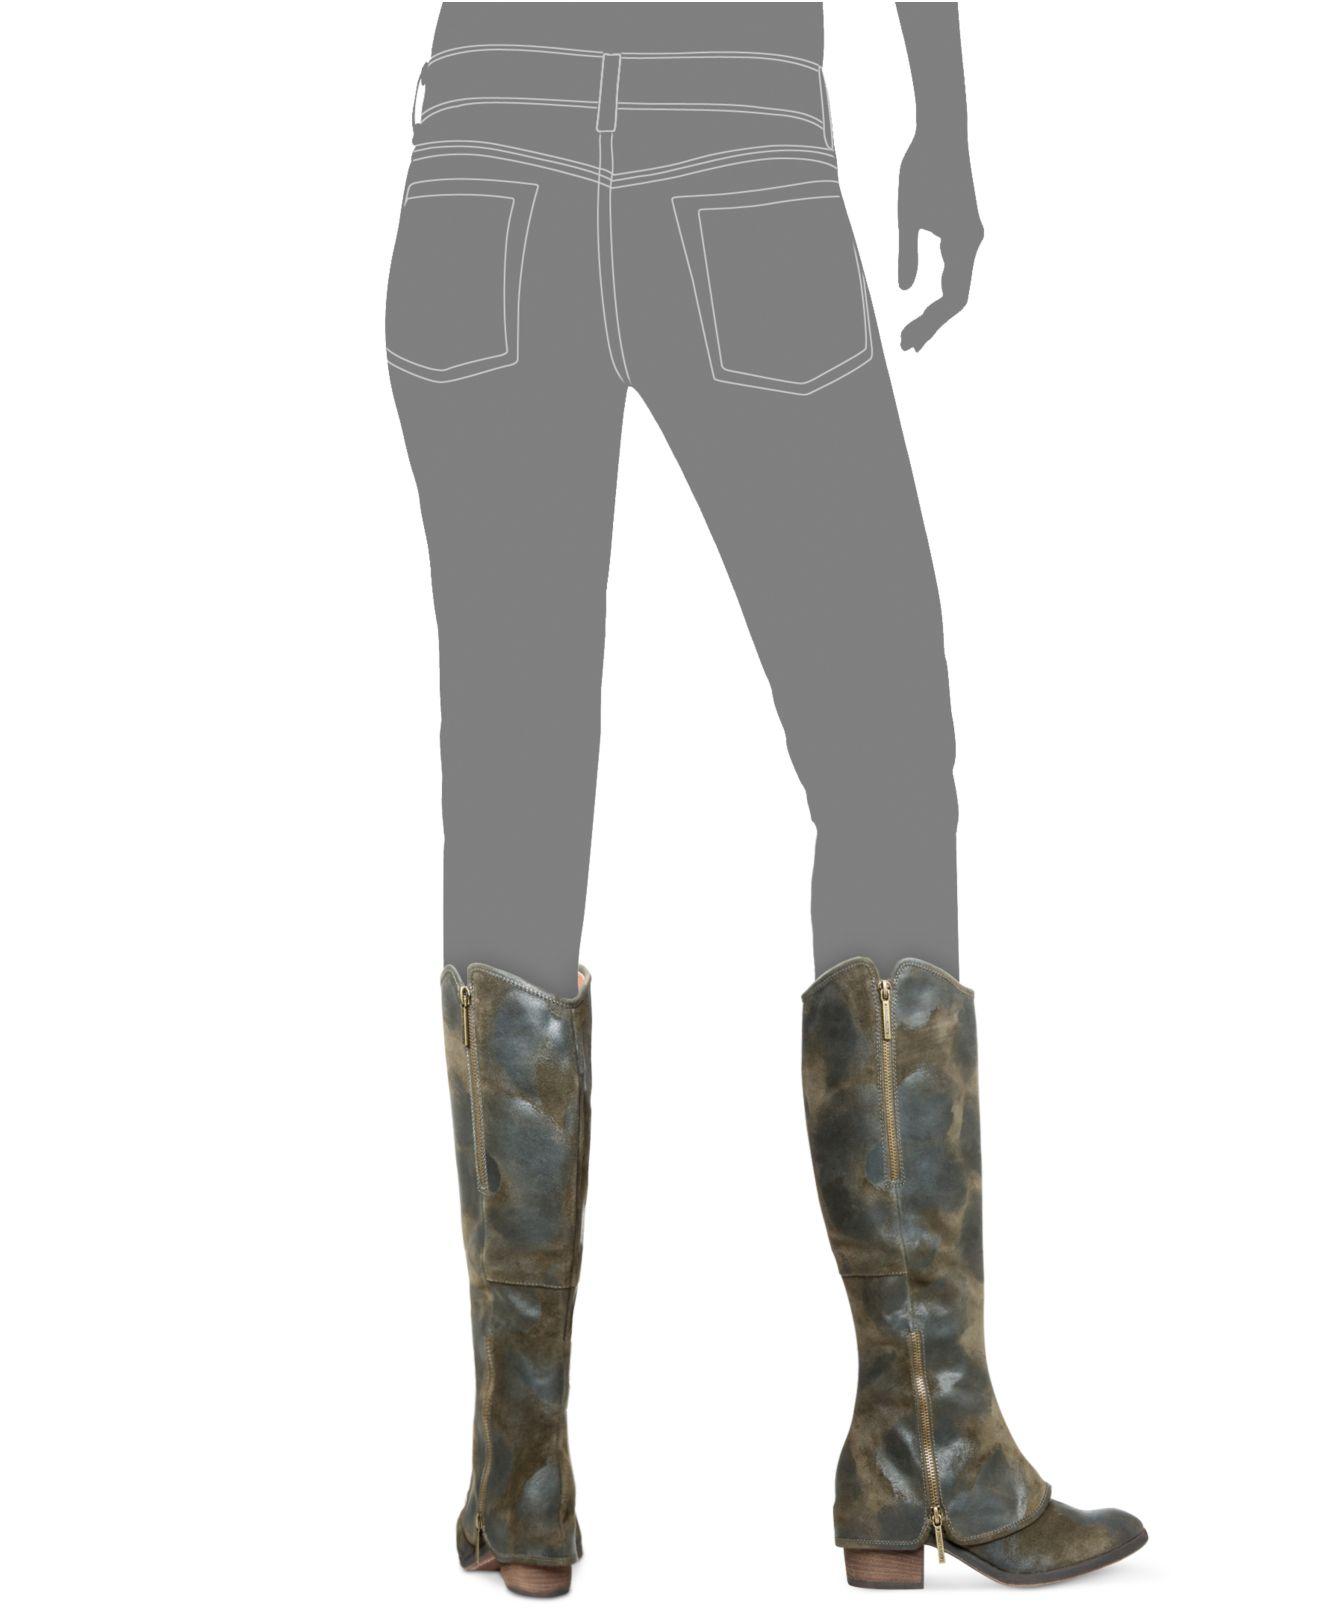 9ee3134047c Lyst - Donald J Pliner Donald J Pliner Devi Tall Wide Calf Boots in ...